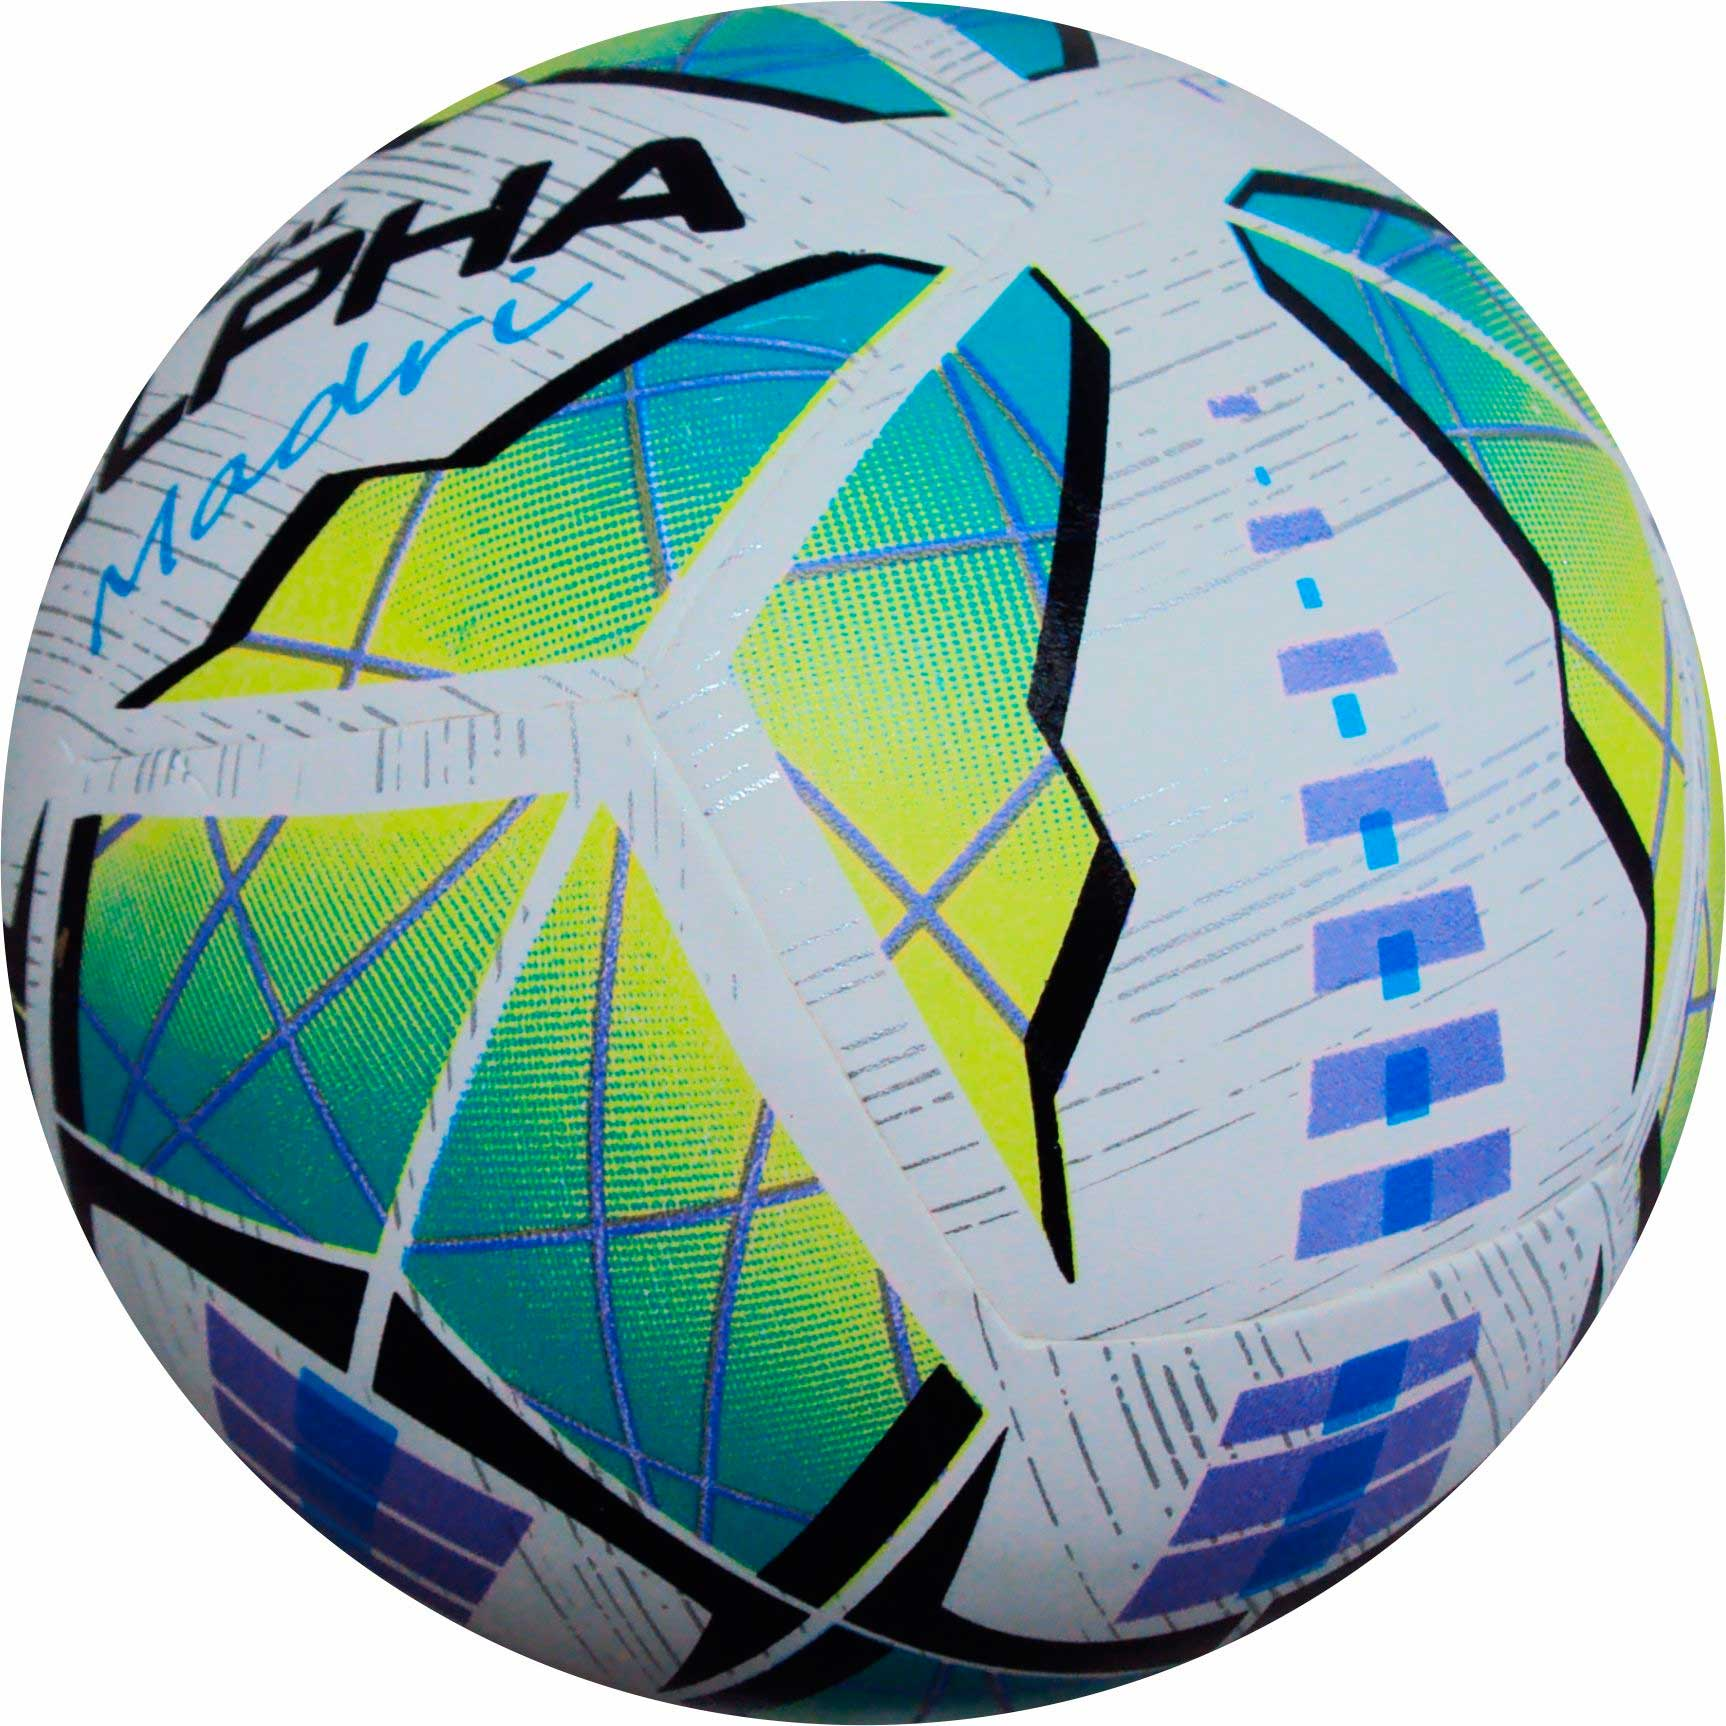 Bola de Futsal Oficial Madri Termoselada - Ref. 689 - Allpha